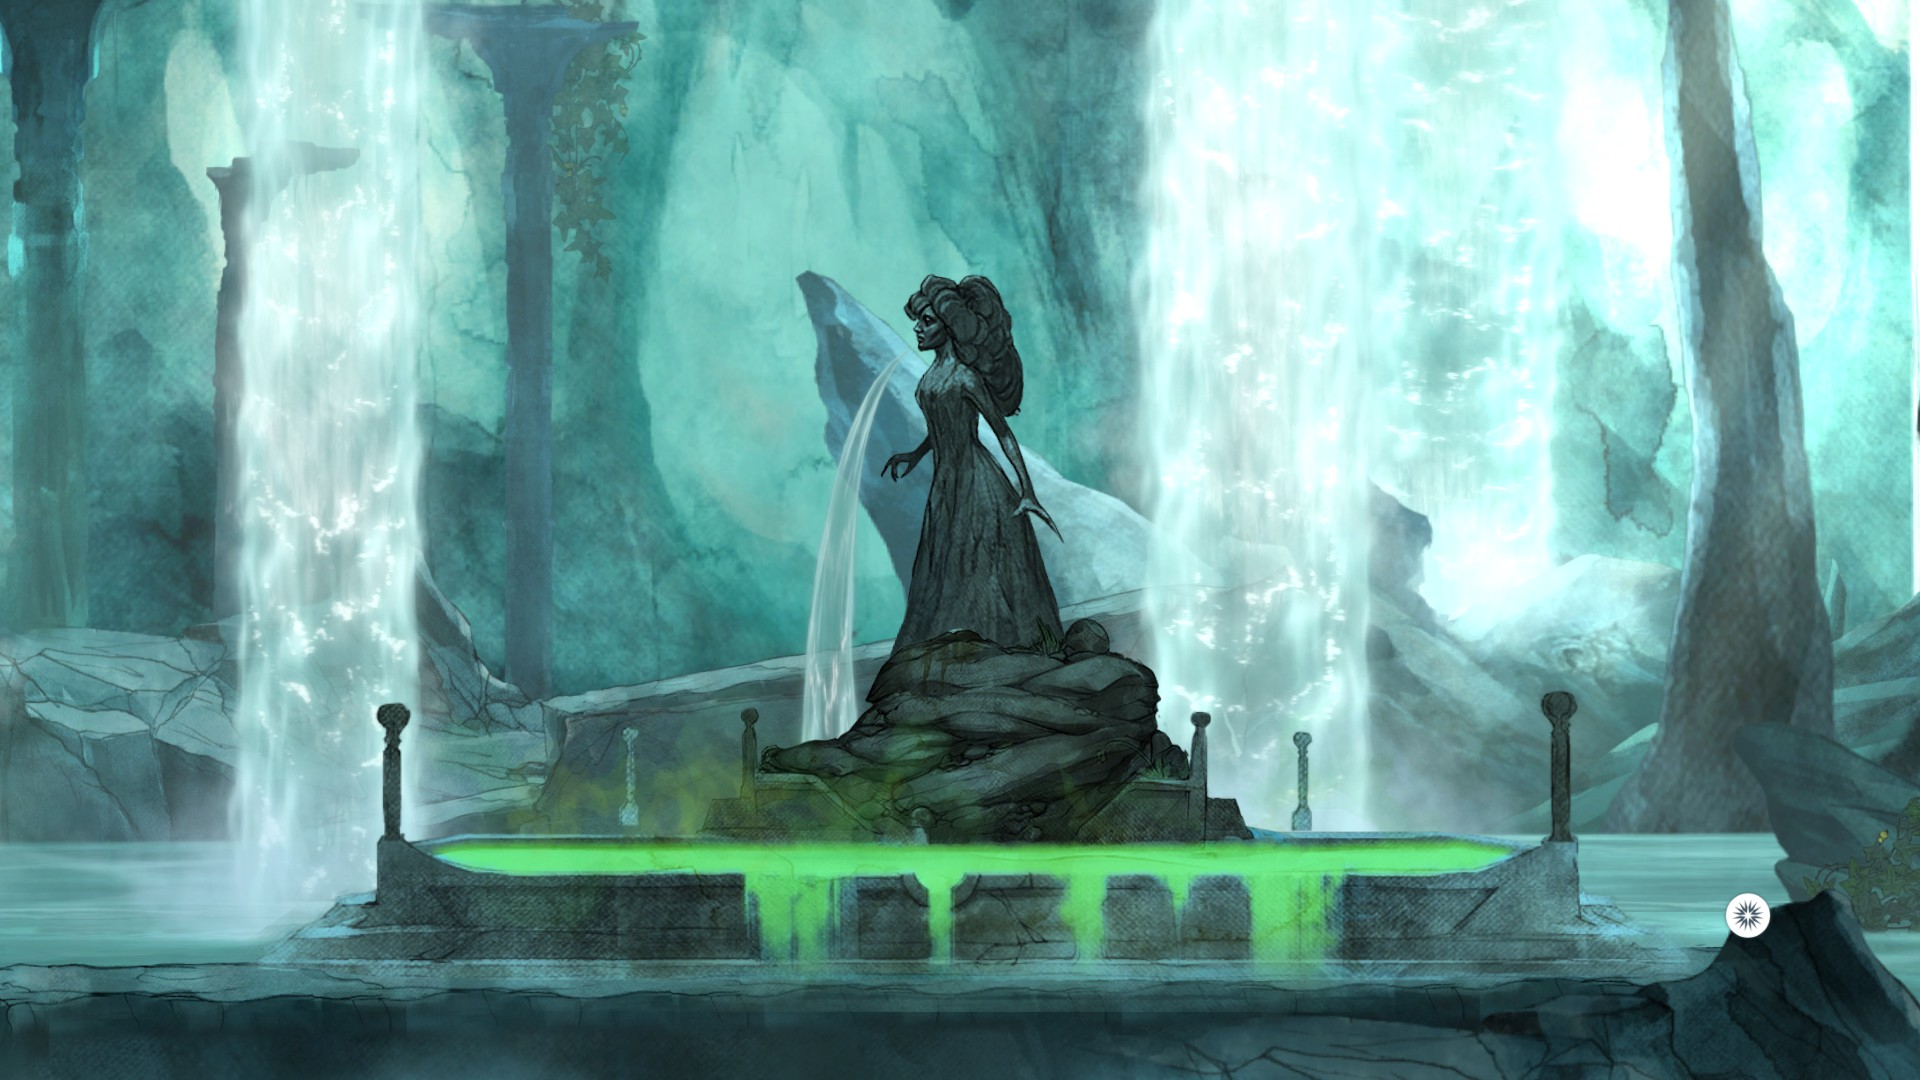 child-of-light-fontaine